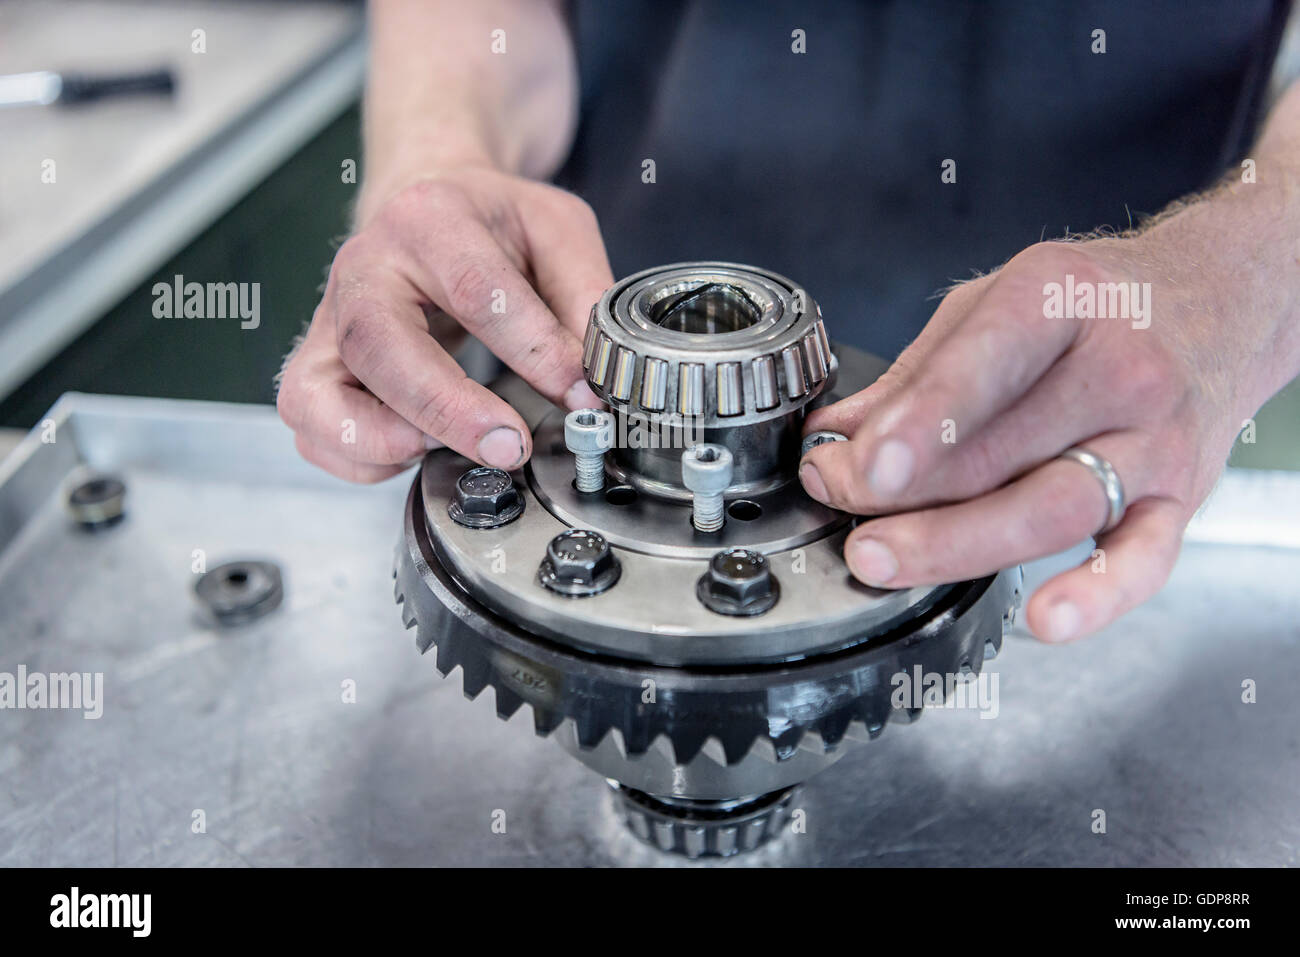 Engineer assembling part in racing car factory - Stock Image